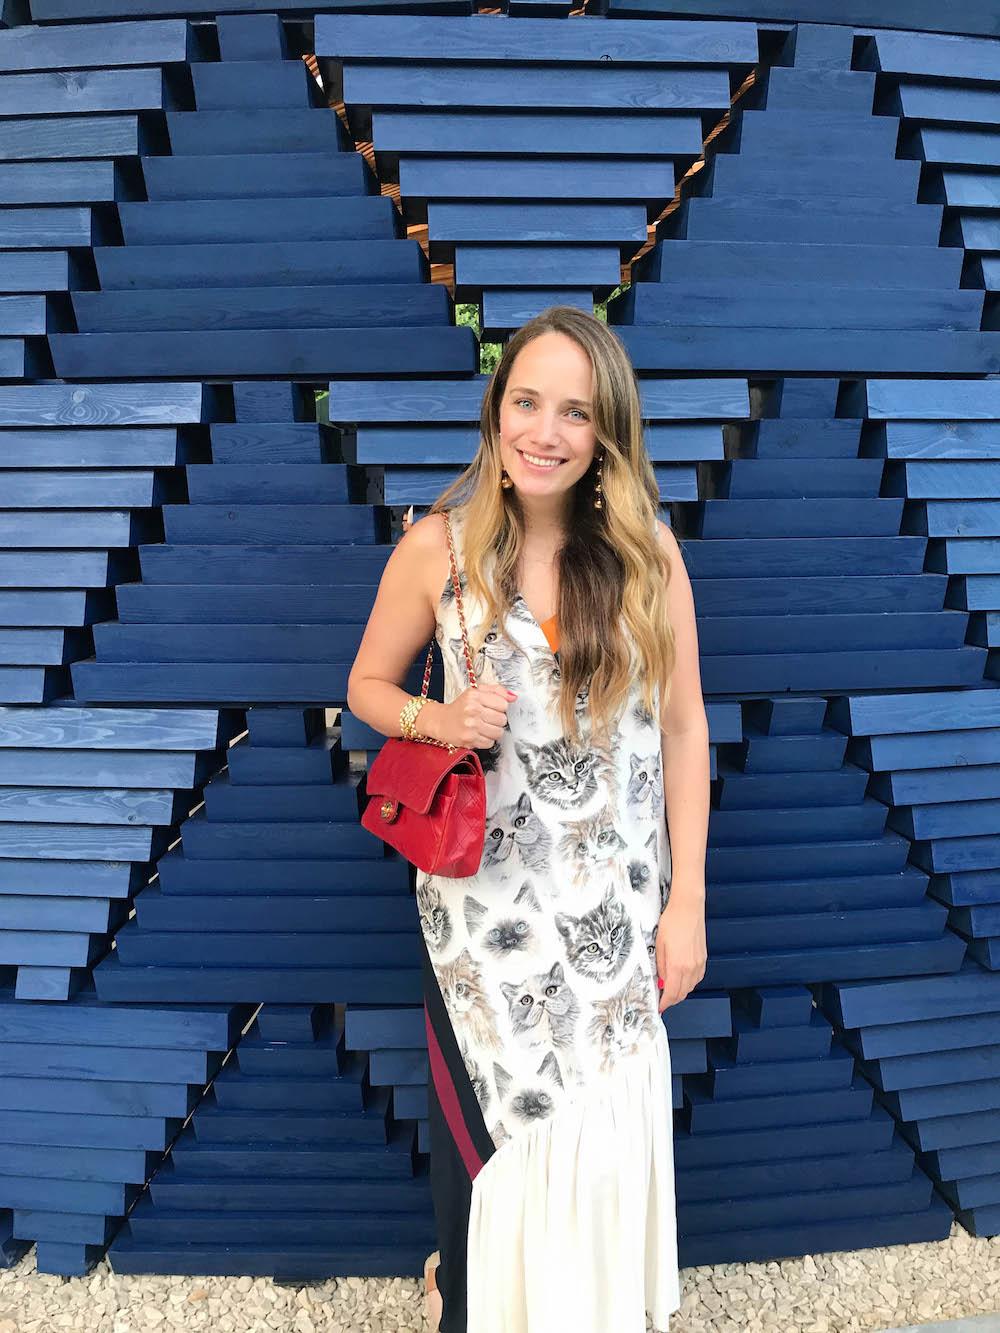 london travel diary - the stripe - serpentine pavilion opening, wearing stella mccartney cat dress